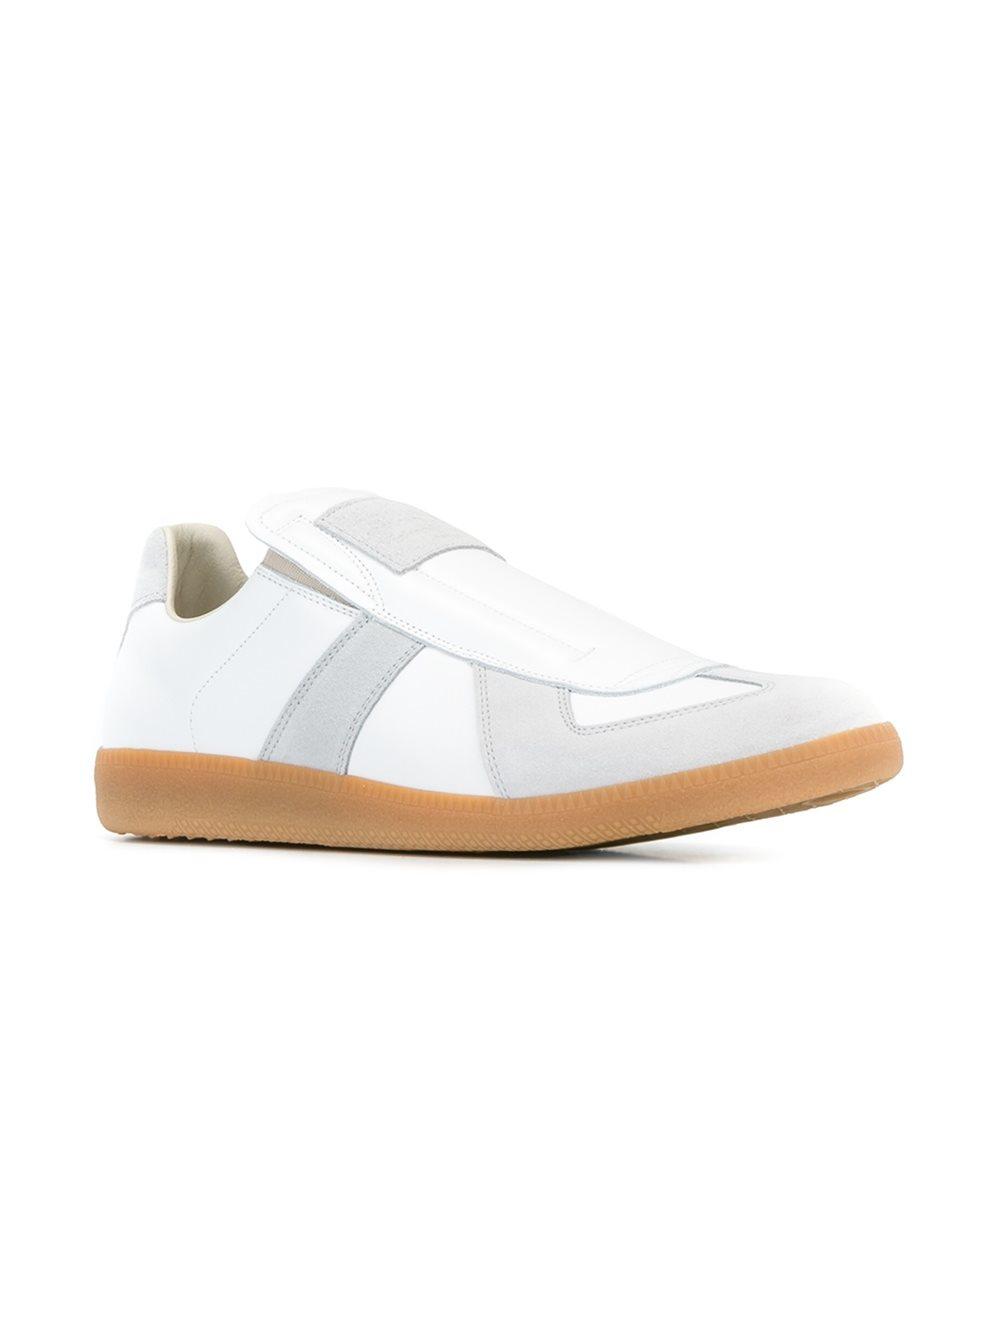 Maison Margiela Replica Sneakers In White For Men Lyst